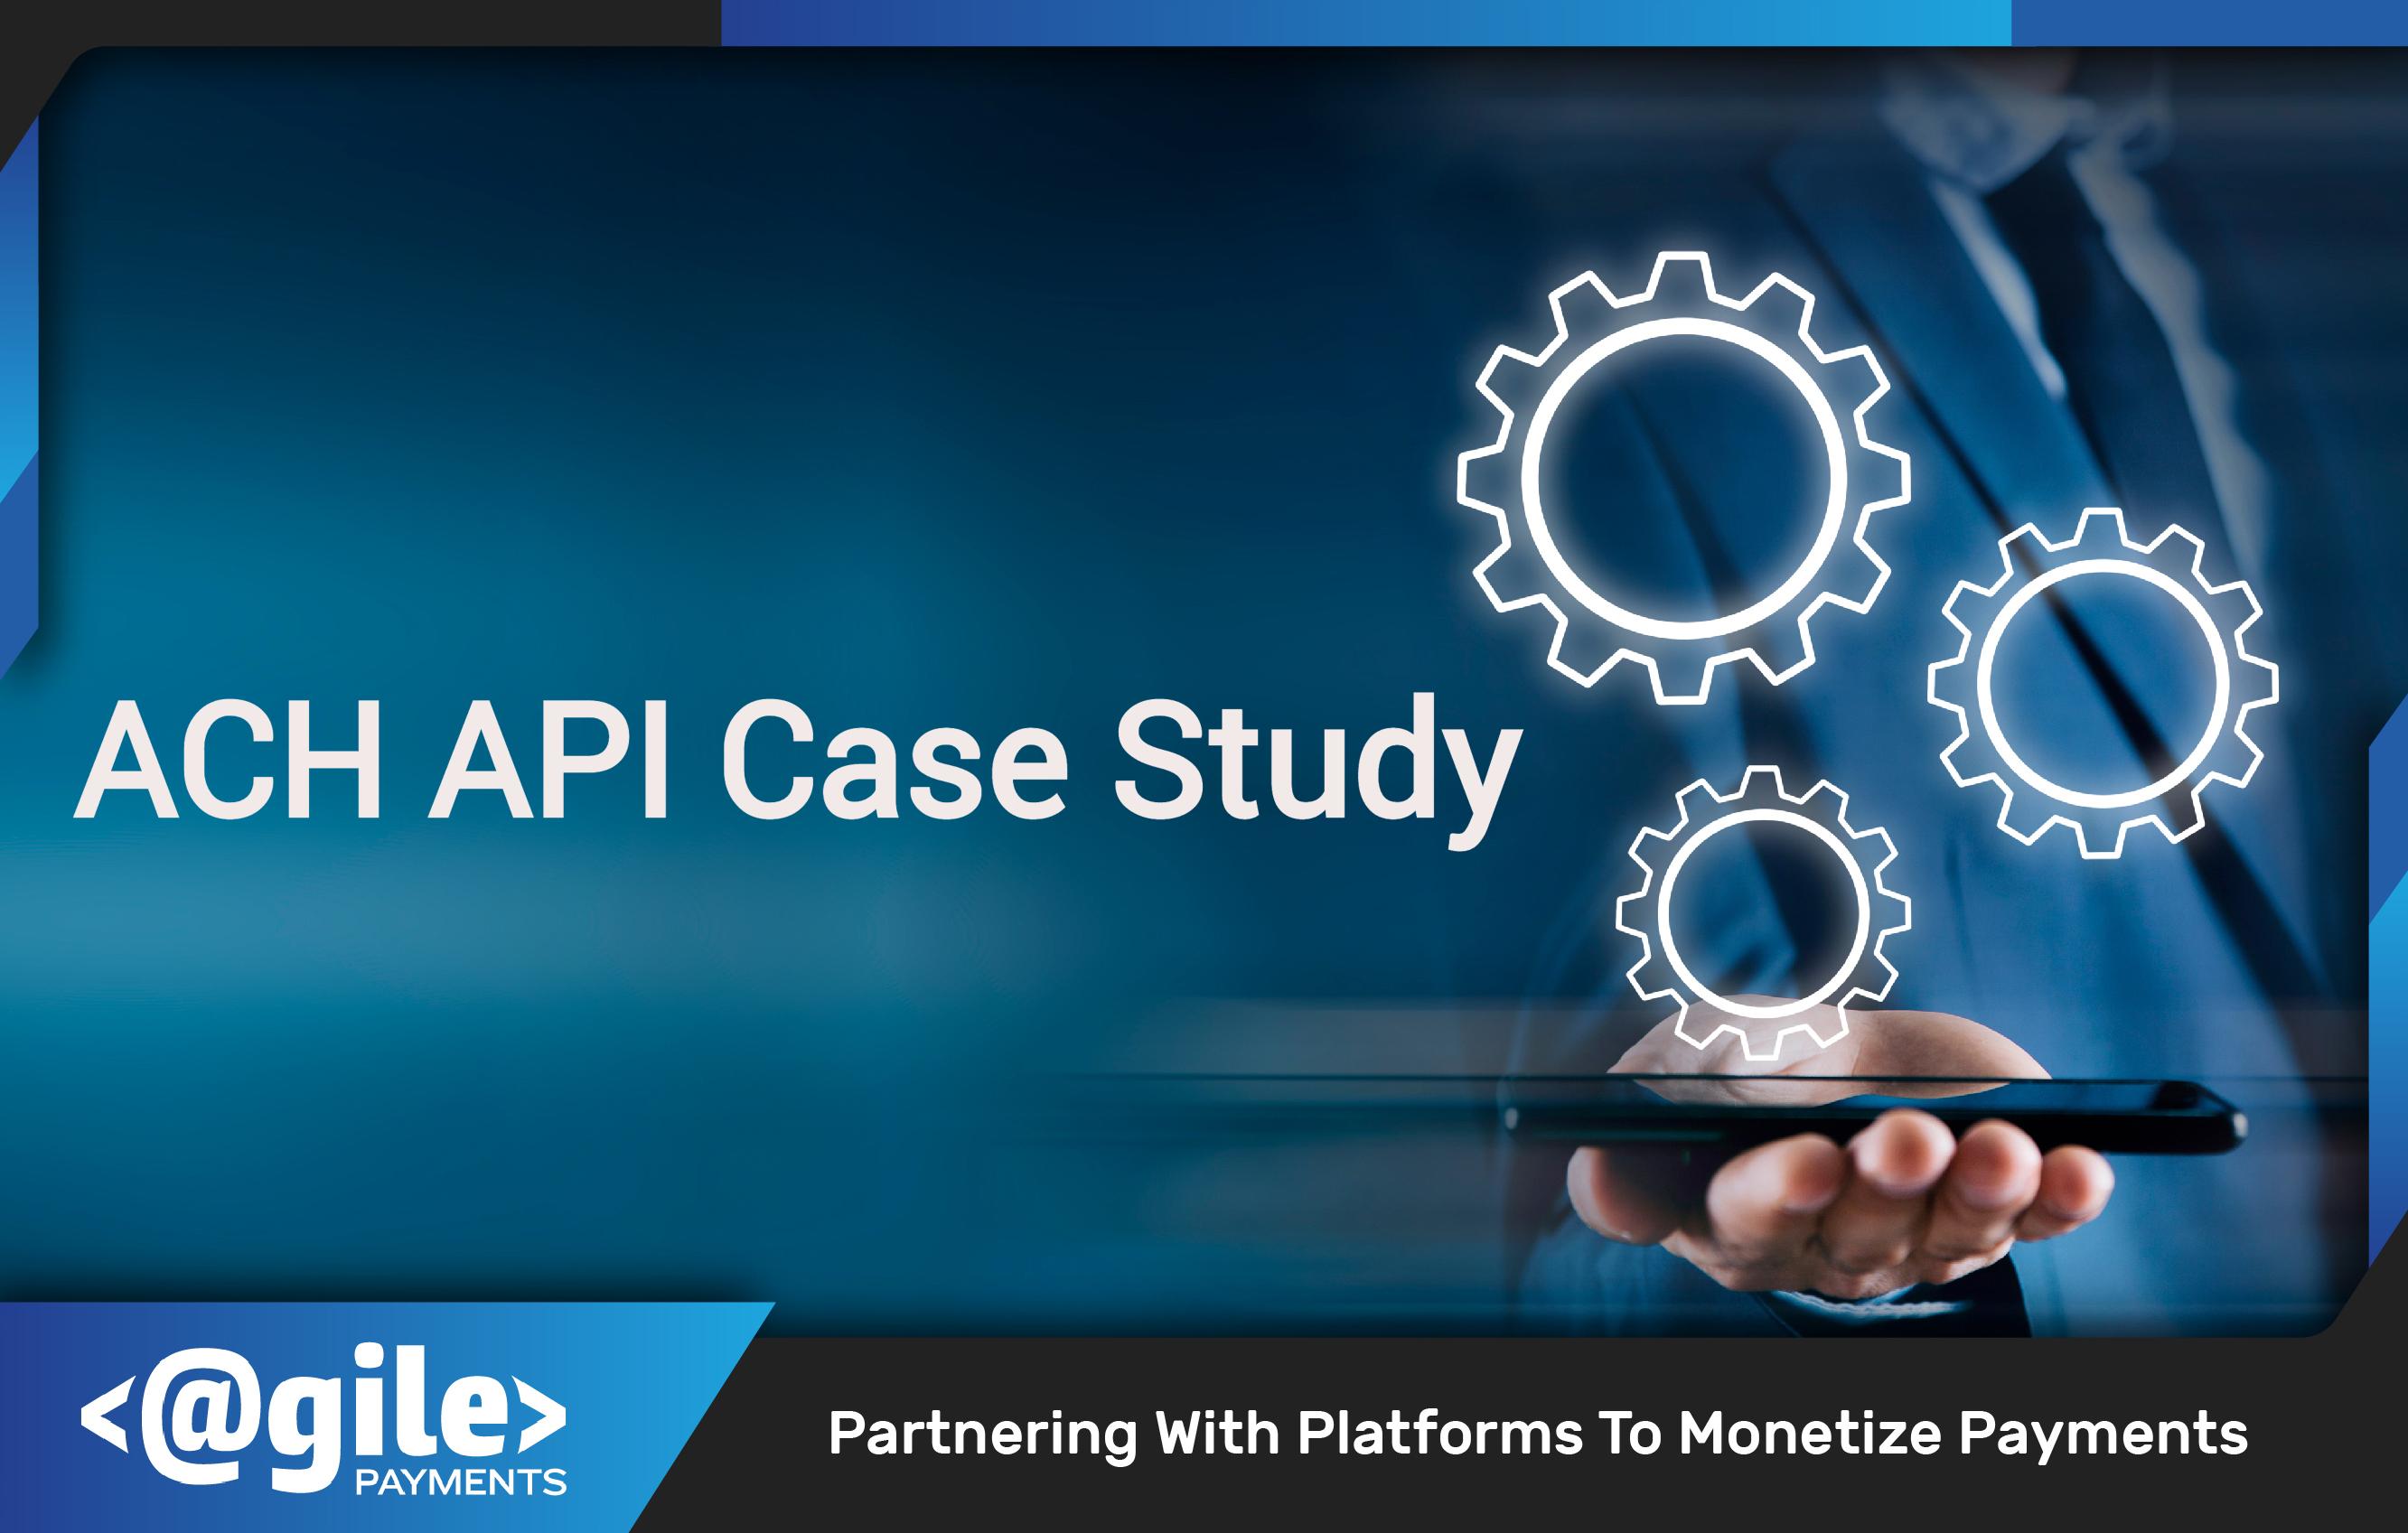 ACH API Case Study